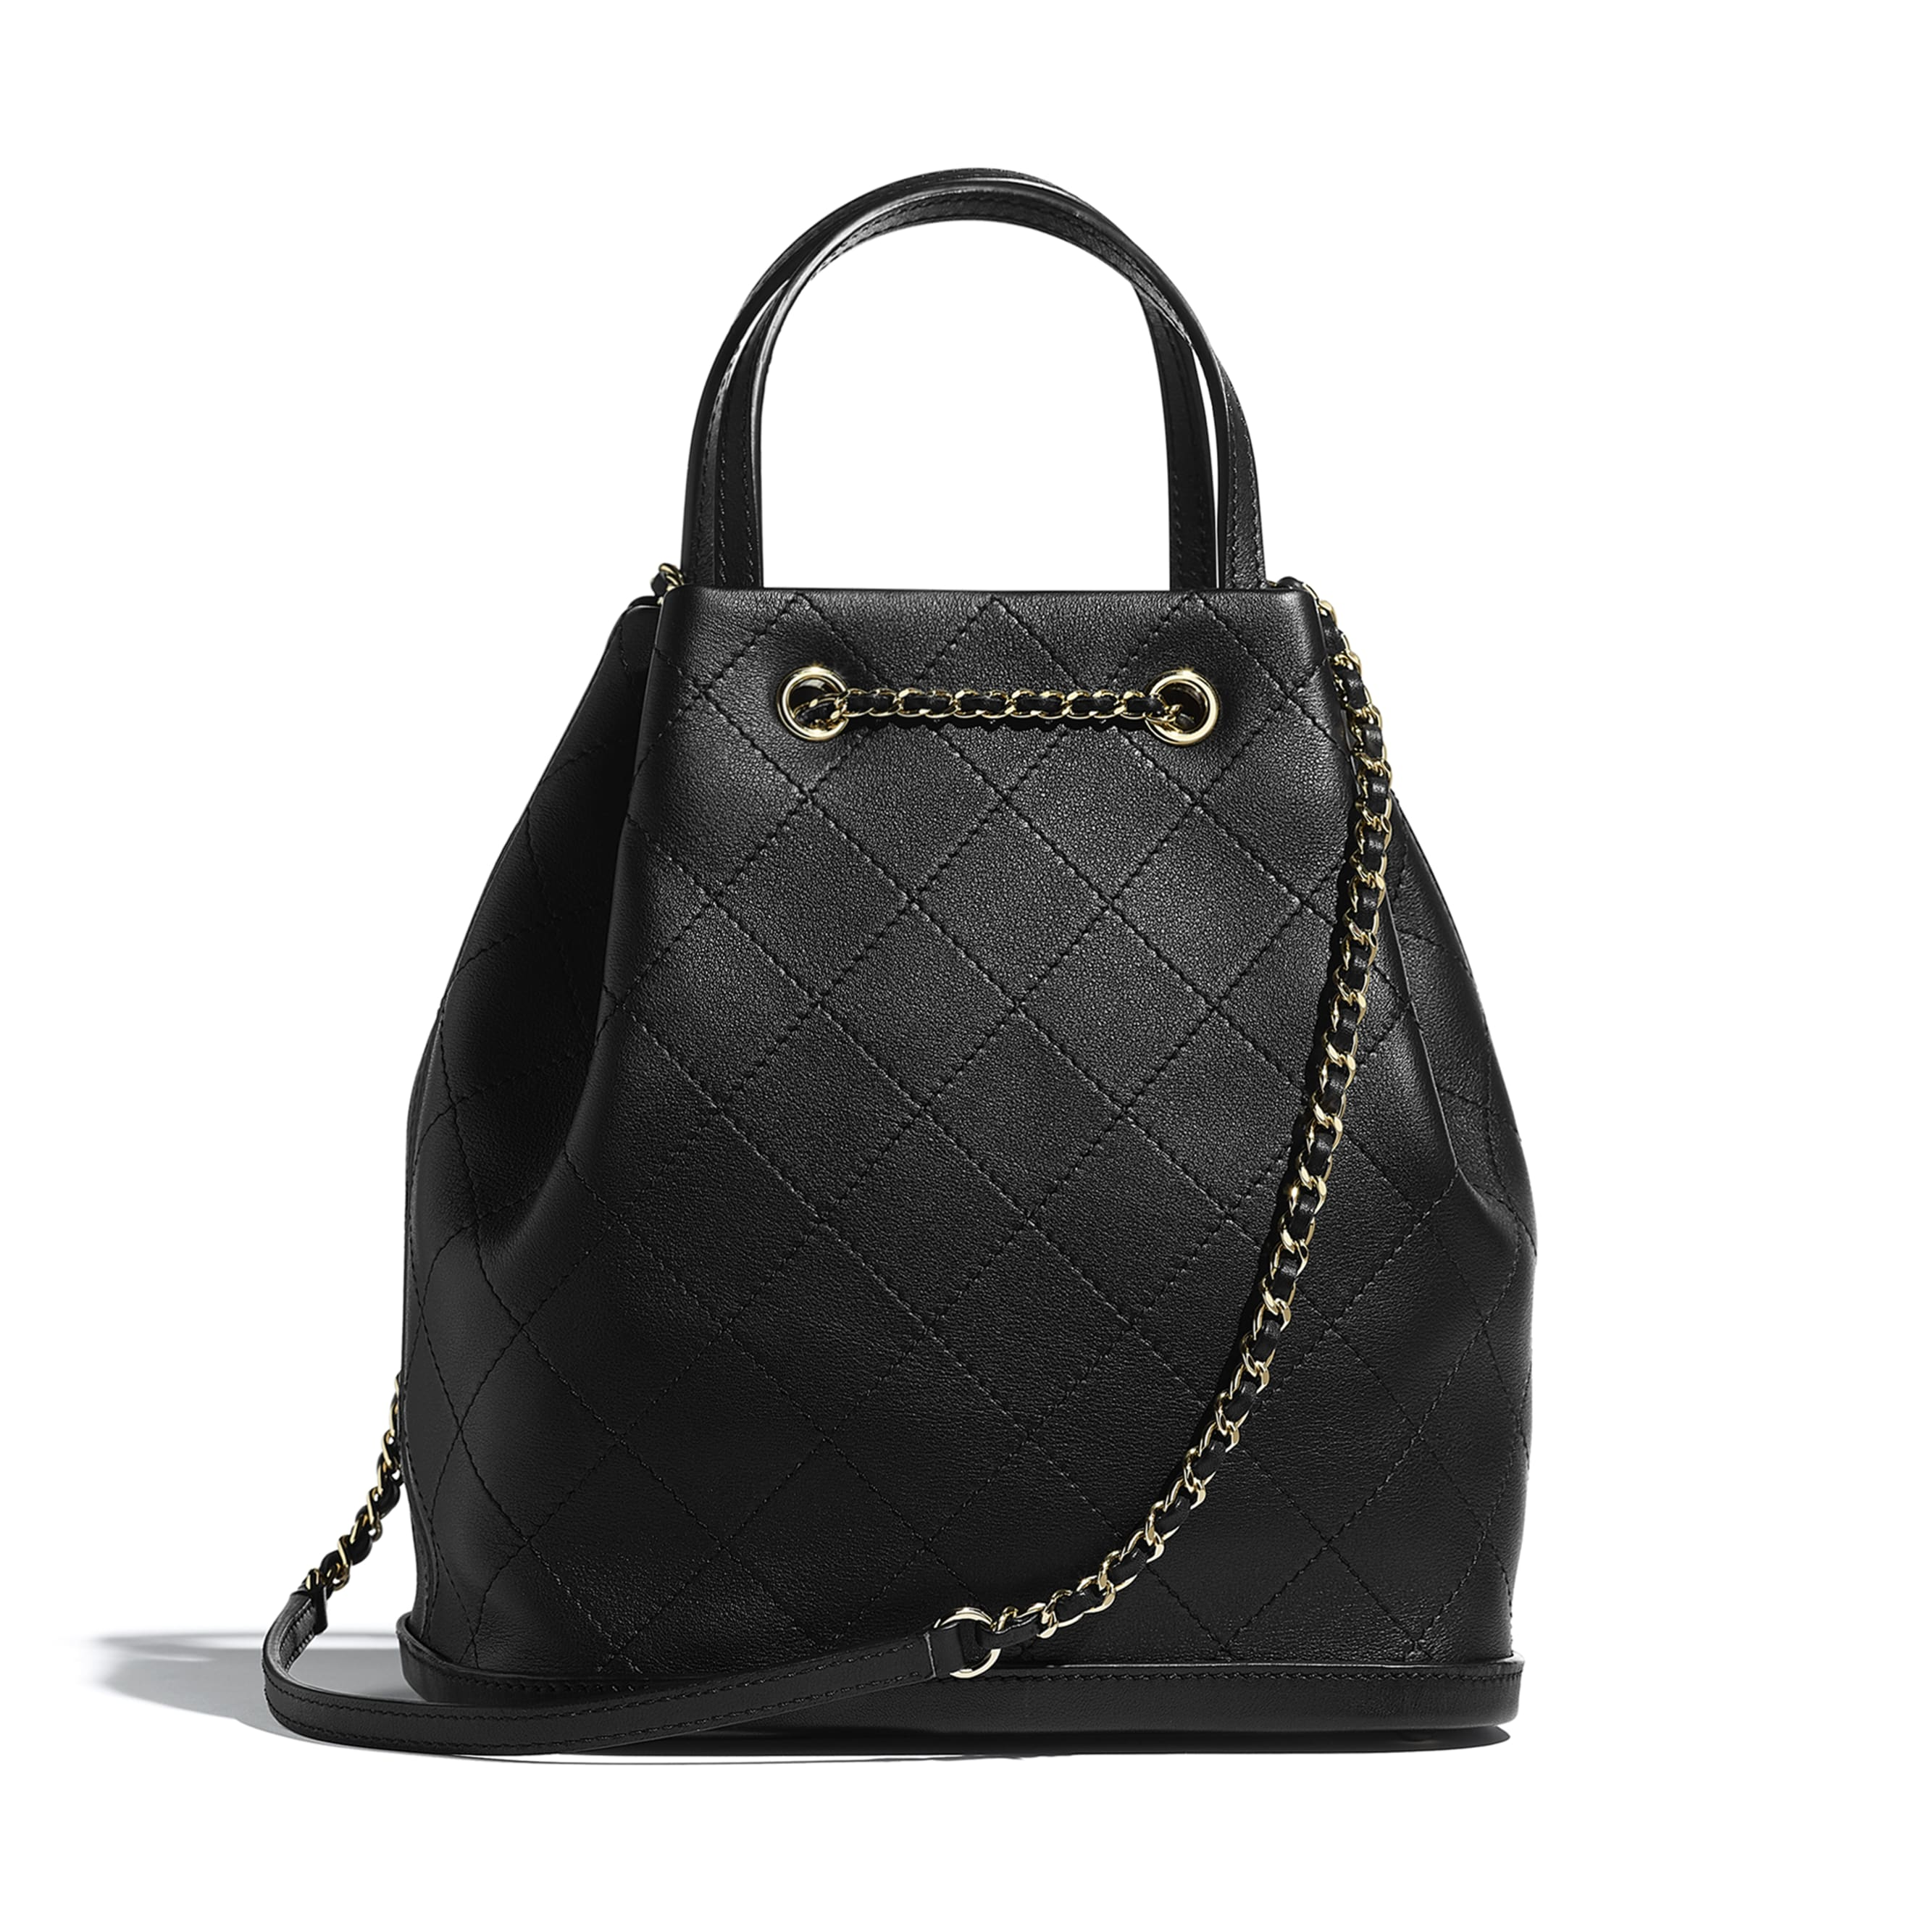 Large Drawstring Bag - Black - Calfskin & Gold-Tone Metal - Alternative view - see standard sized version